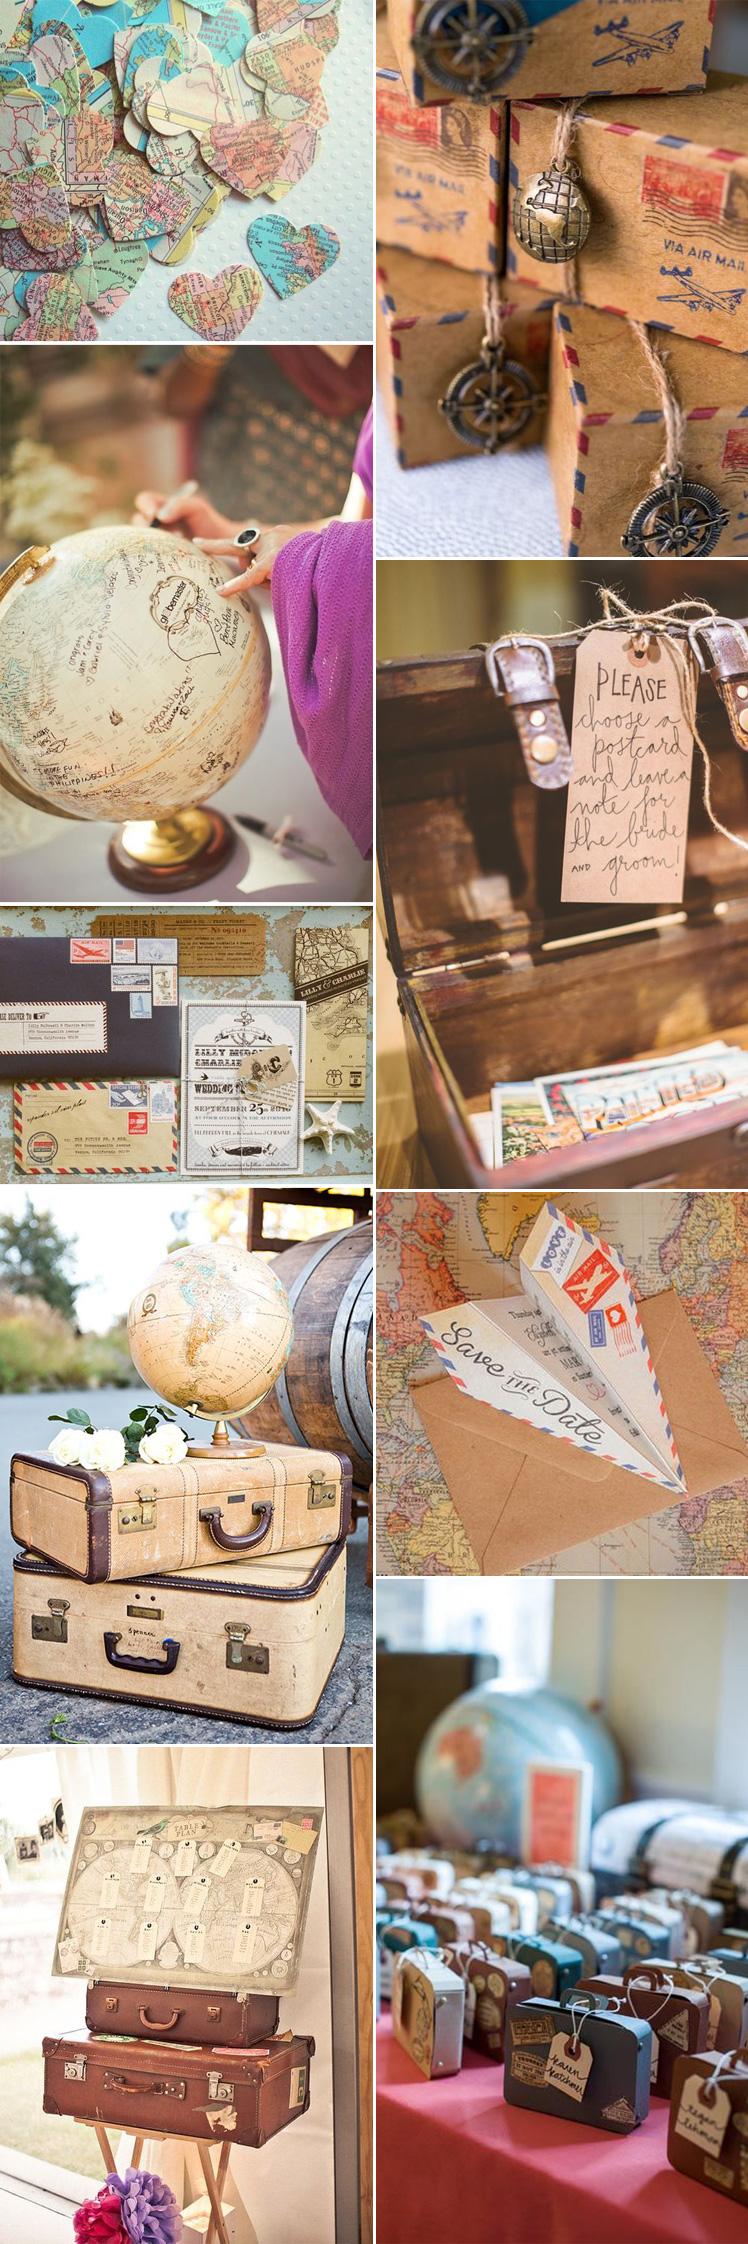 a-vintage-travel-themed-wedding-1.jpg